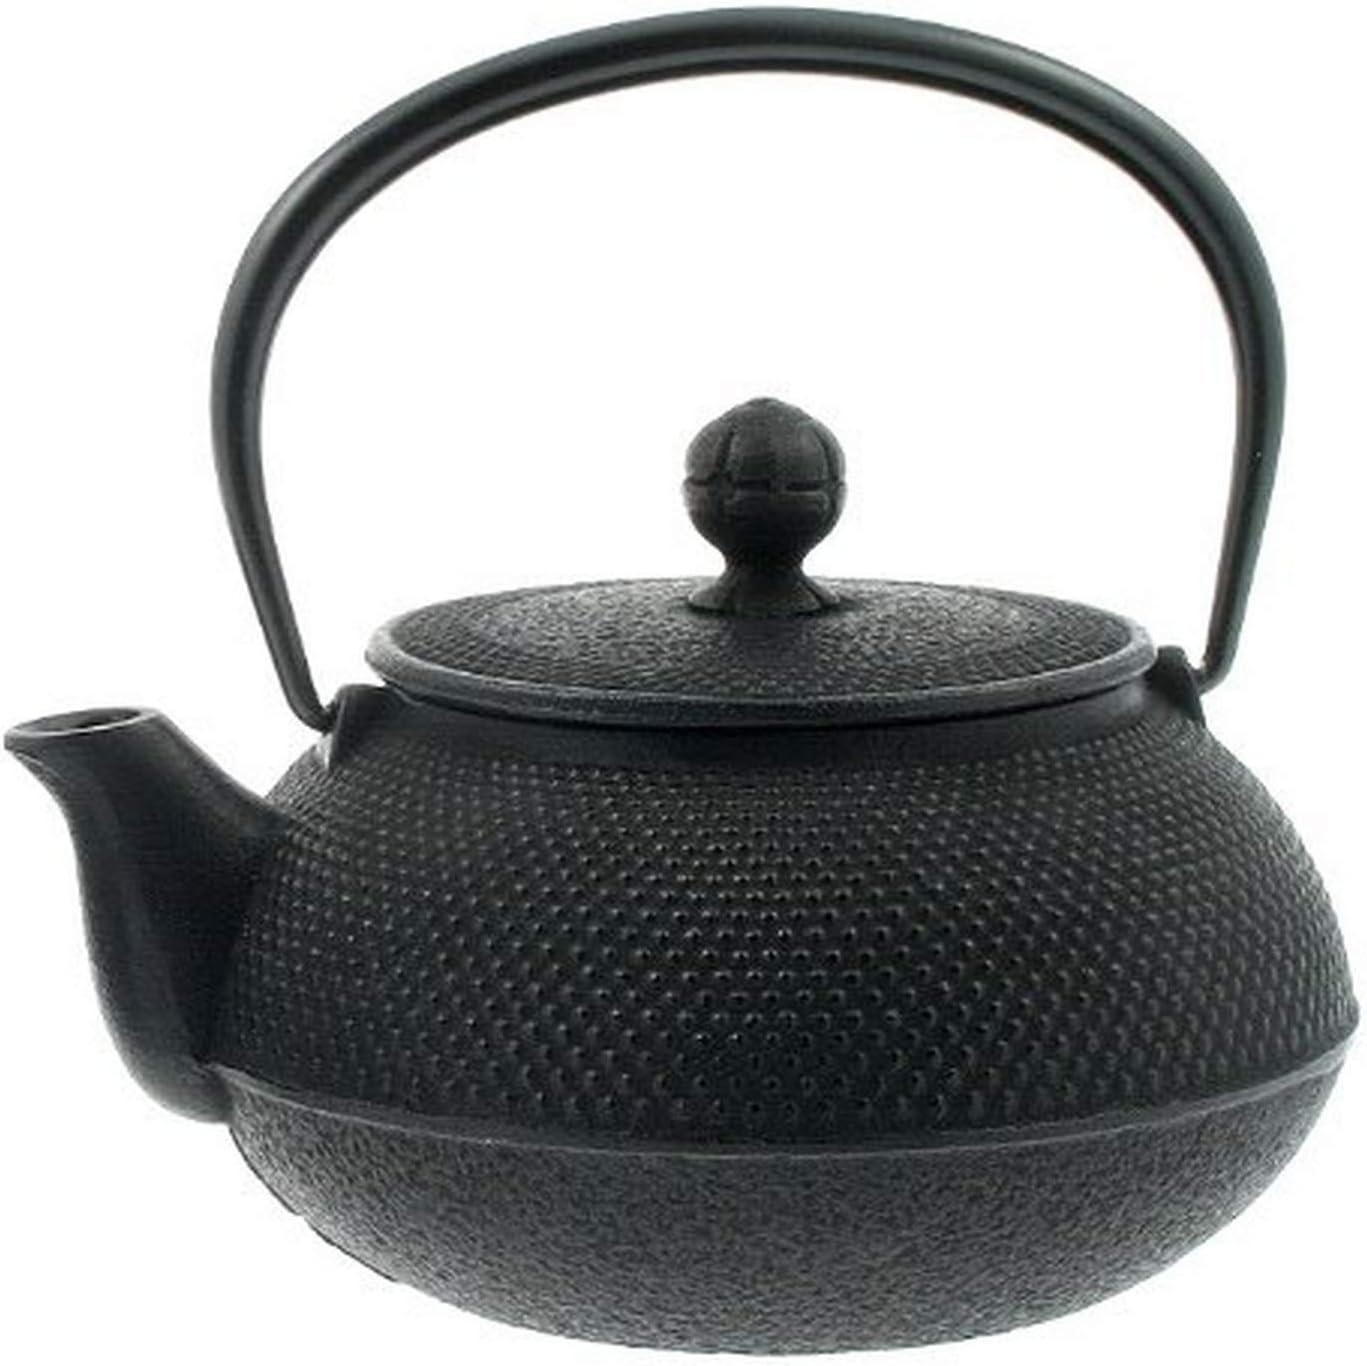 Large Iwachu 29-Ounce Japanese Iron Hobnail Tetsubin Teapot Black Kotobuki 480-134